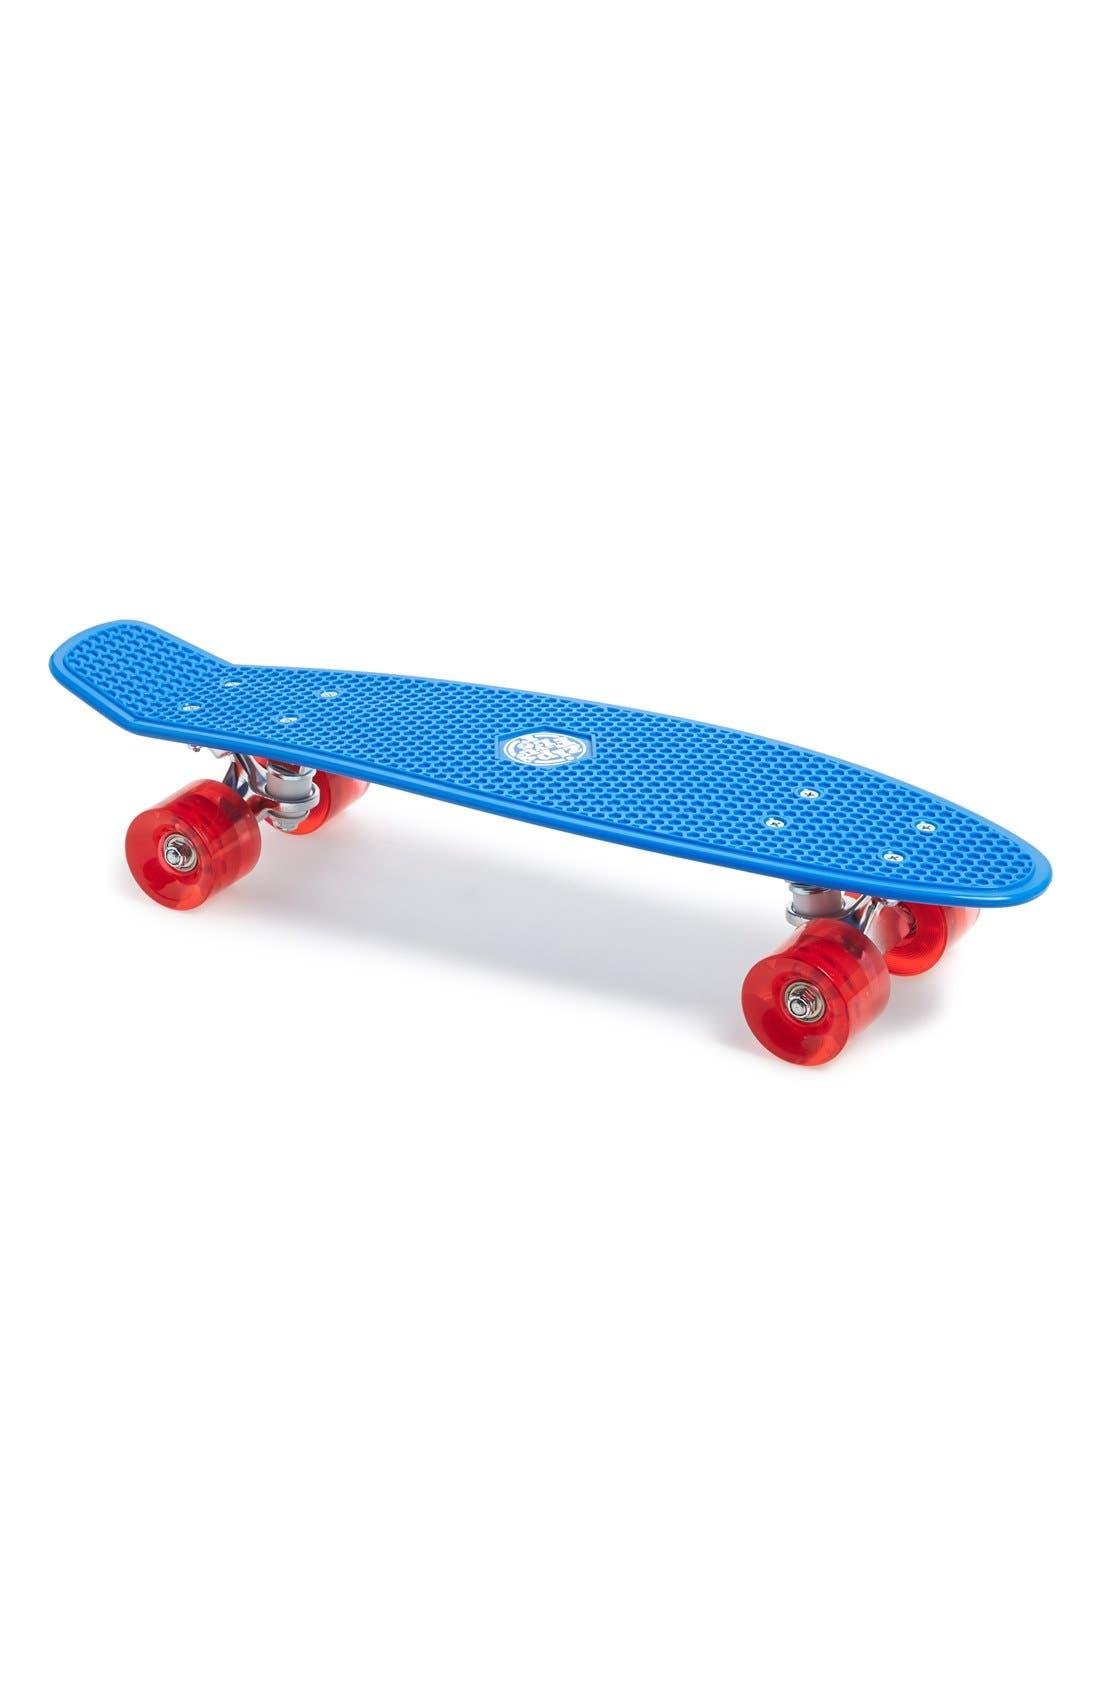 Main Image - Zippy Flyer Skateboard